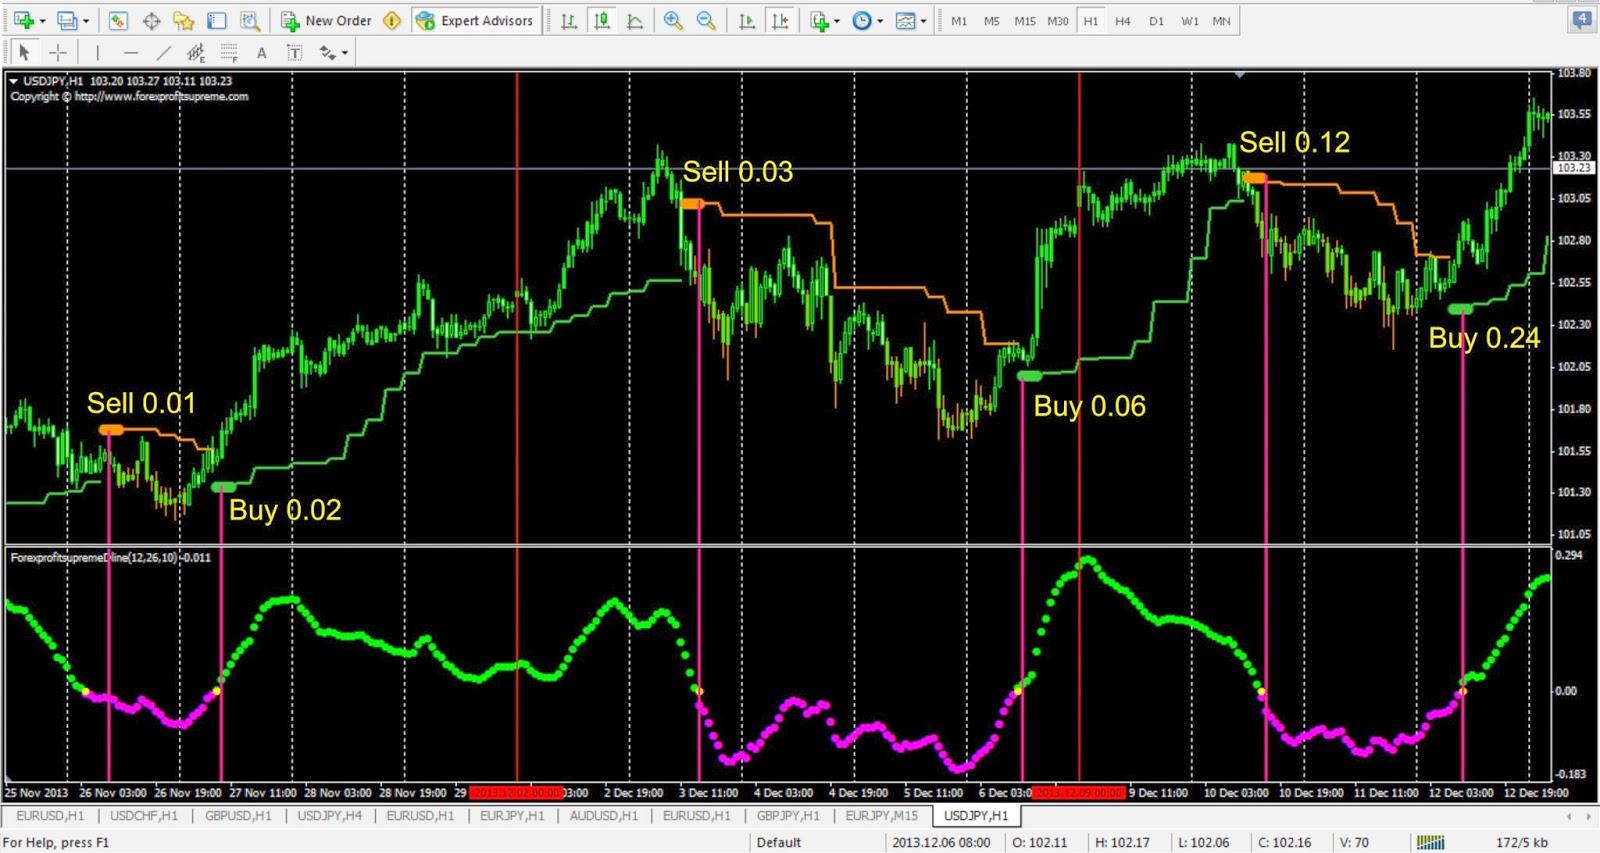 Sinyal forex lewat bbm